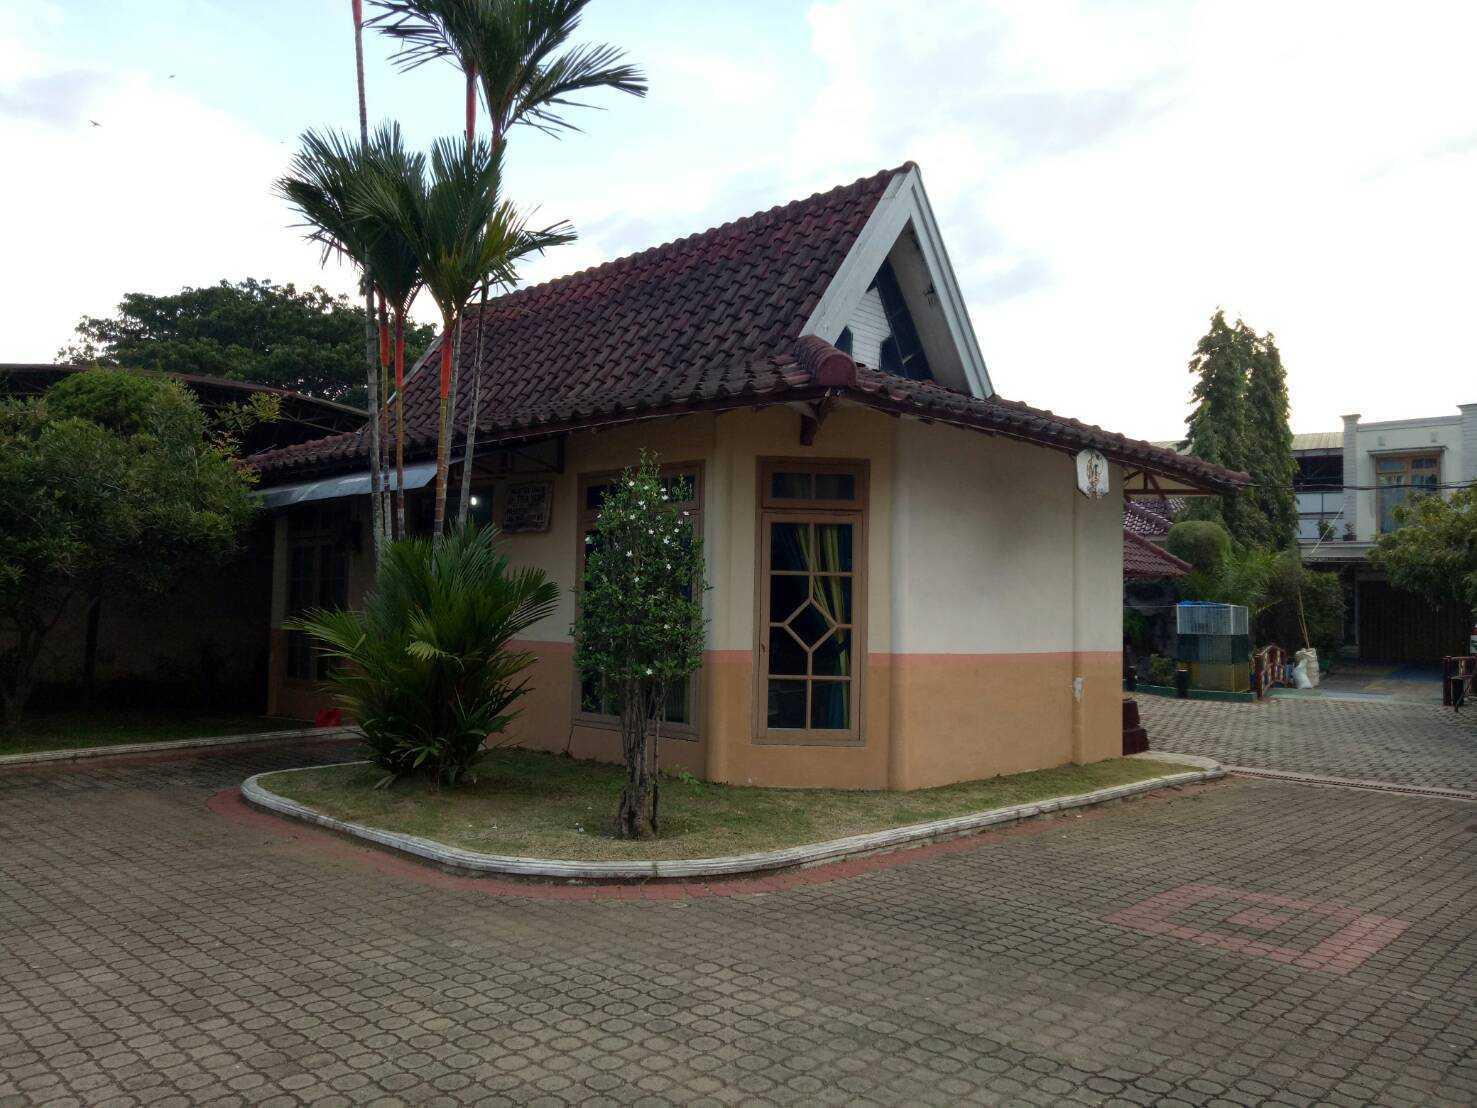 Sevi Edelweis Klinik Dokter Dan Kantor  Bandar Lampung, Kota Bandar Lampung, Lampung, Indonesia Bandar Lampung, Kota Bandar Lampung, Lampung, Indonesia Exterior View  44862